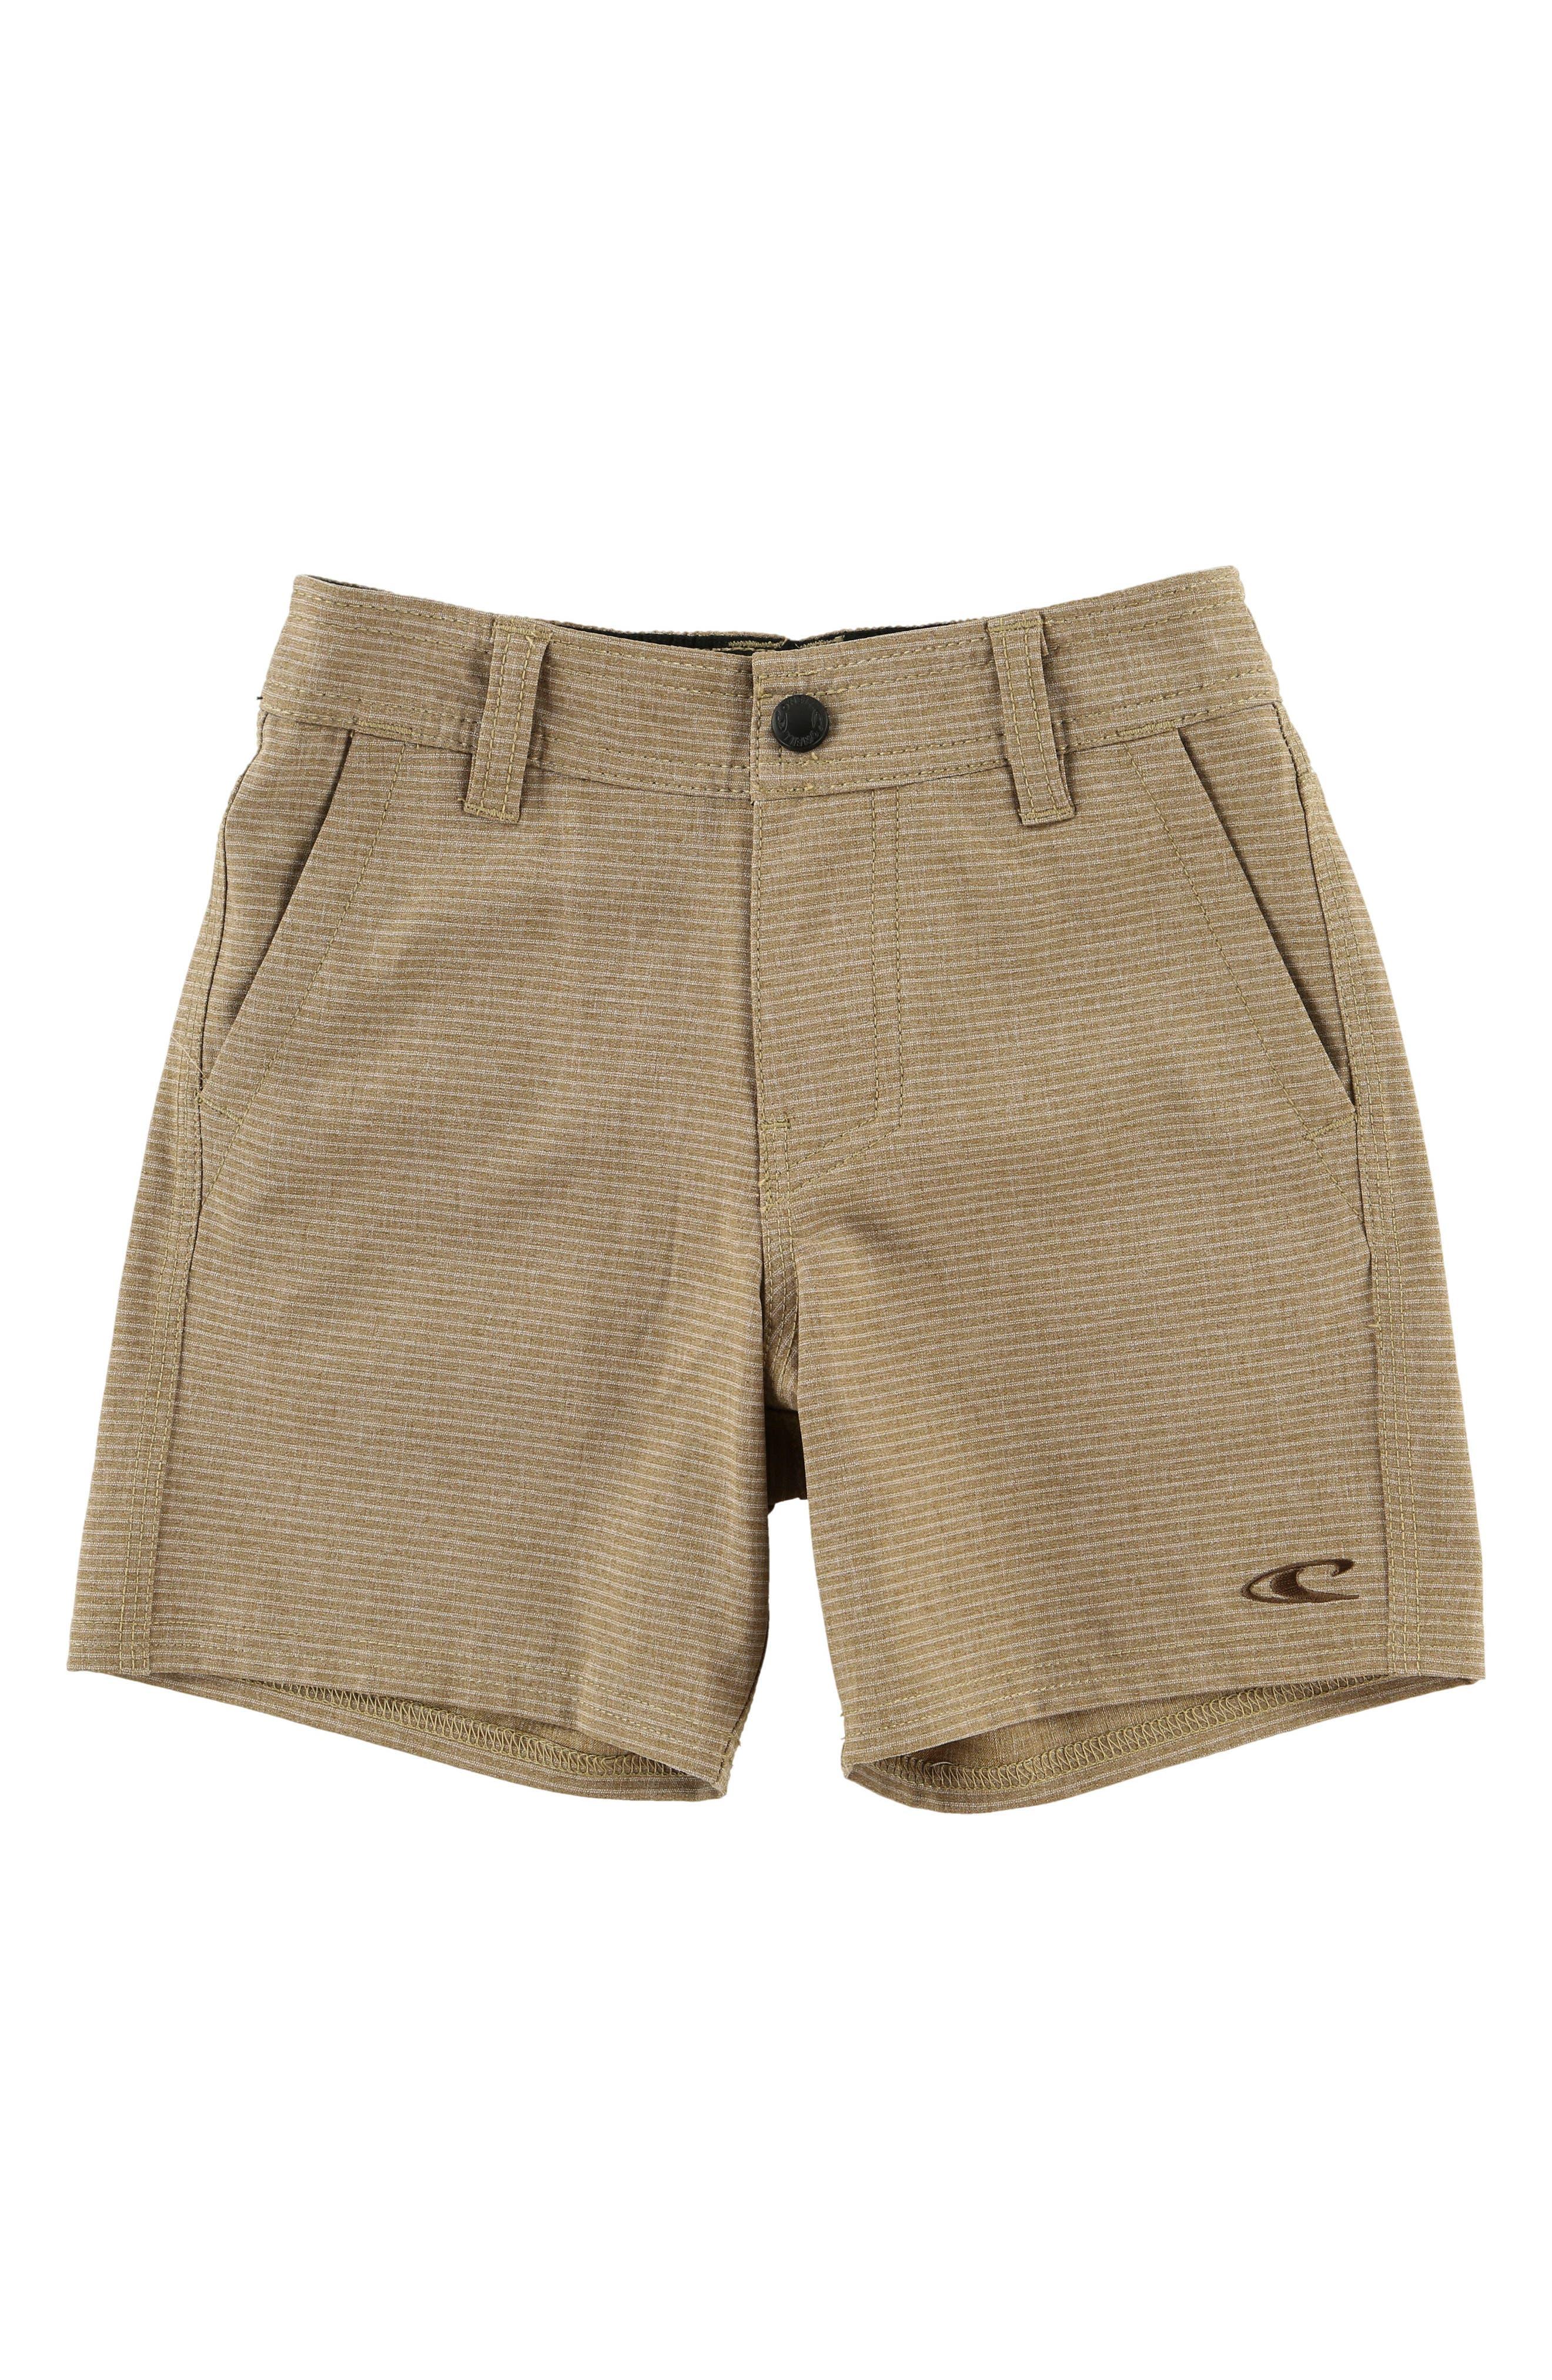 Locked Stripe Hybrid Shorts,                         Main,                         color, 205